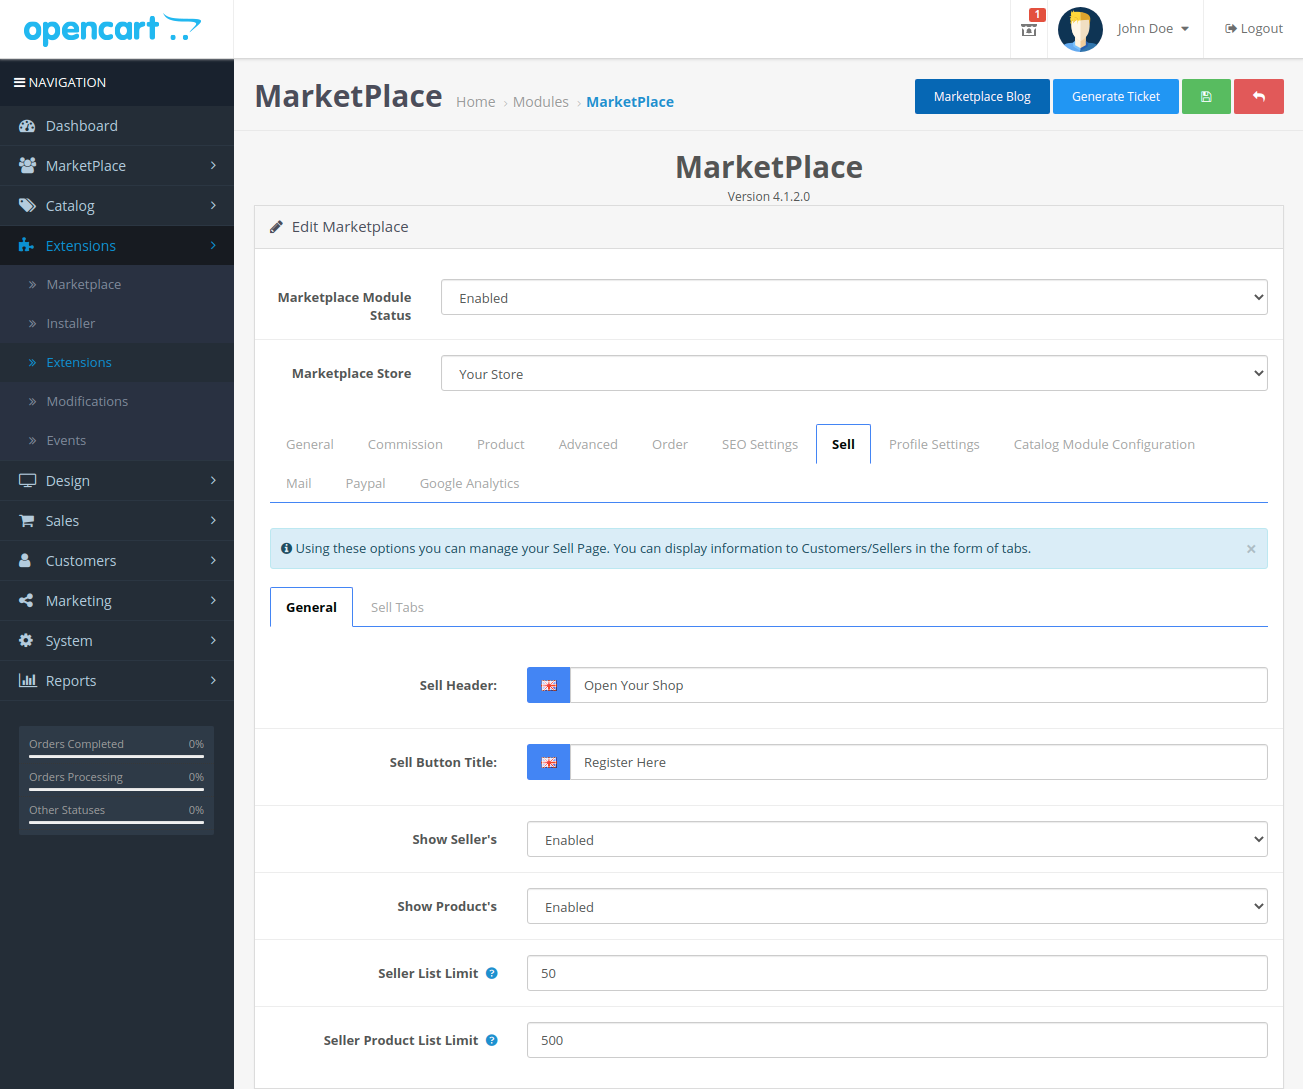 webkul-opencart-multi-vendor-marketplace-sell-tab-general-1